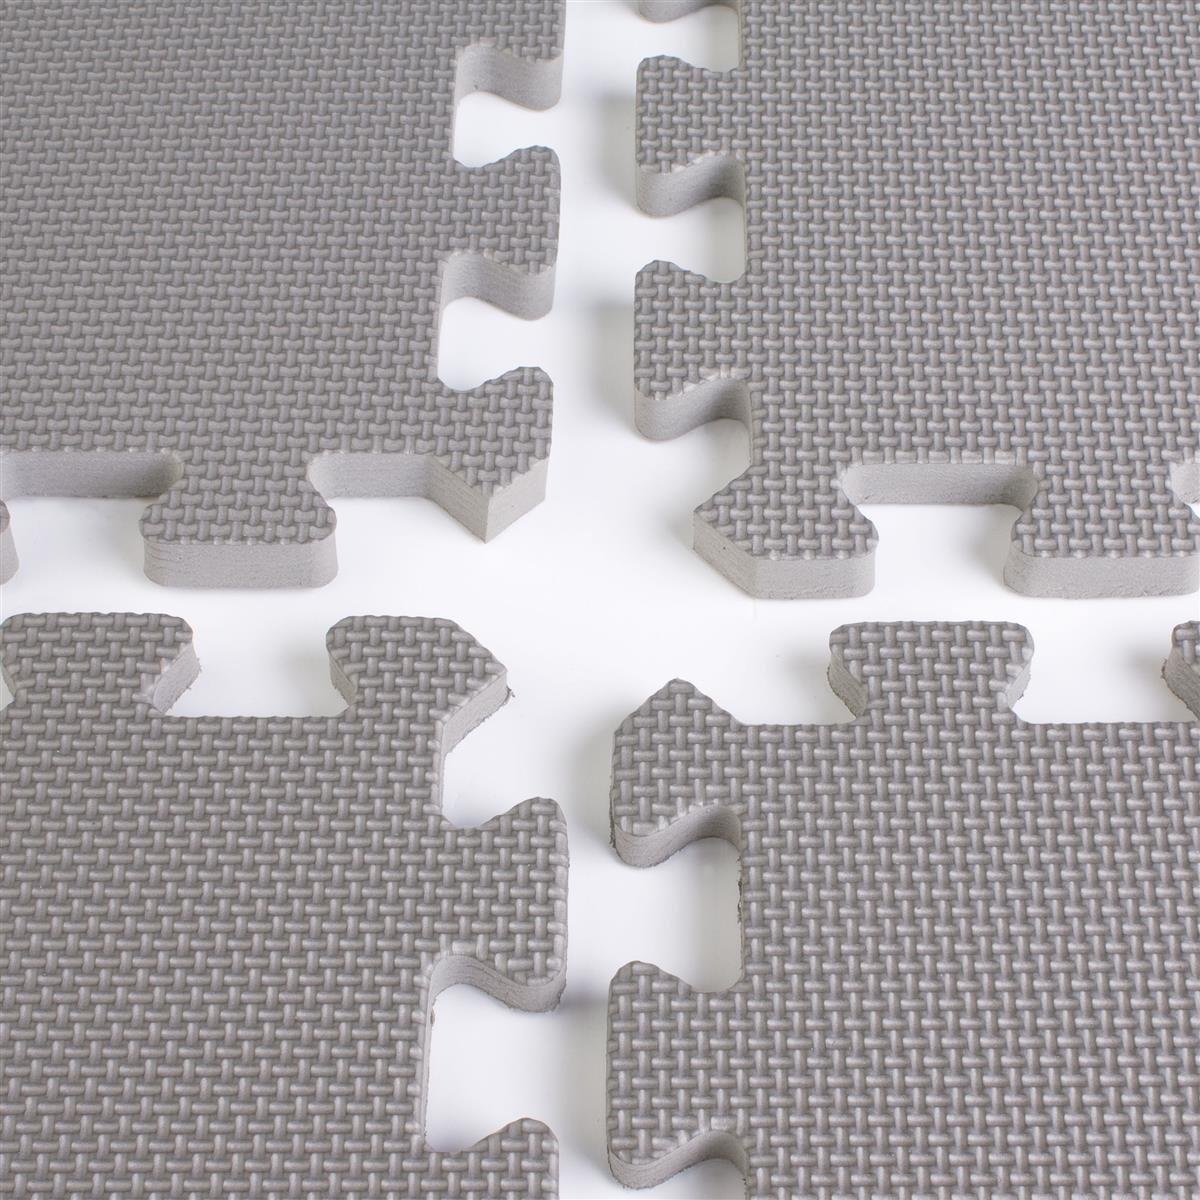 Displays2go Portable Floor For Tradeshows, 10 x 10 Feet Charcoal Grey Foam Mat, 2 x 2 Feet Interlocking Pieces (TSFM10GY)